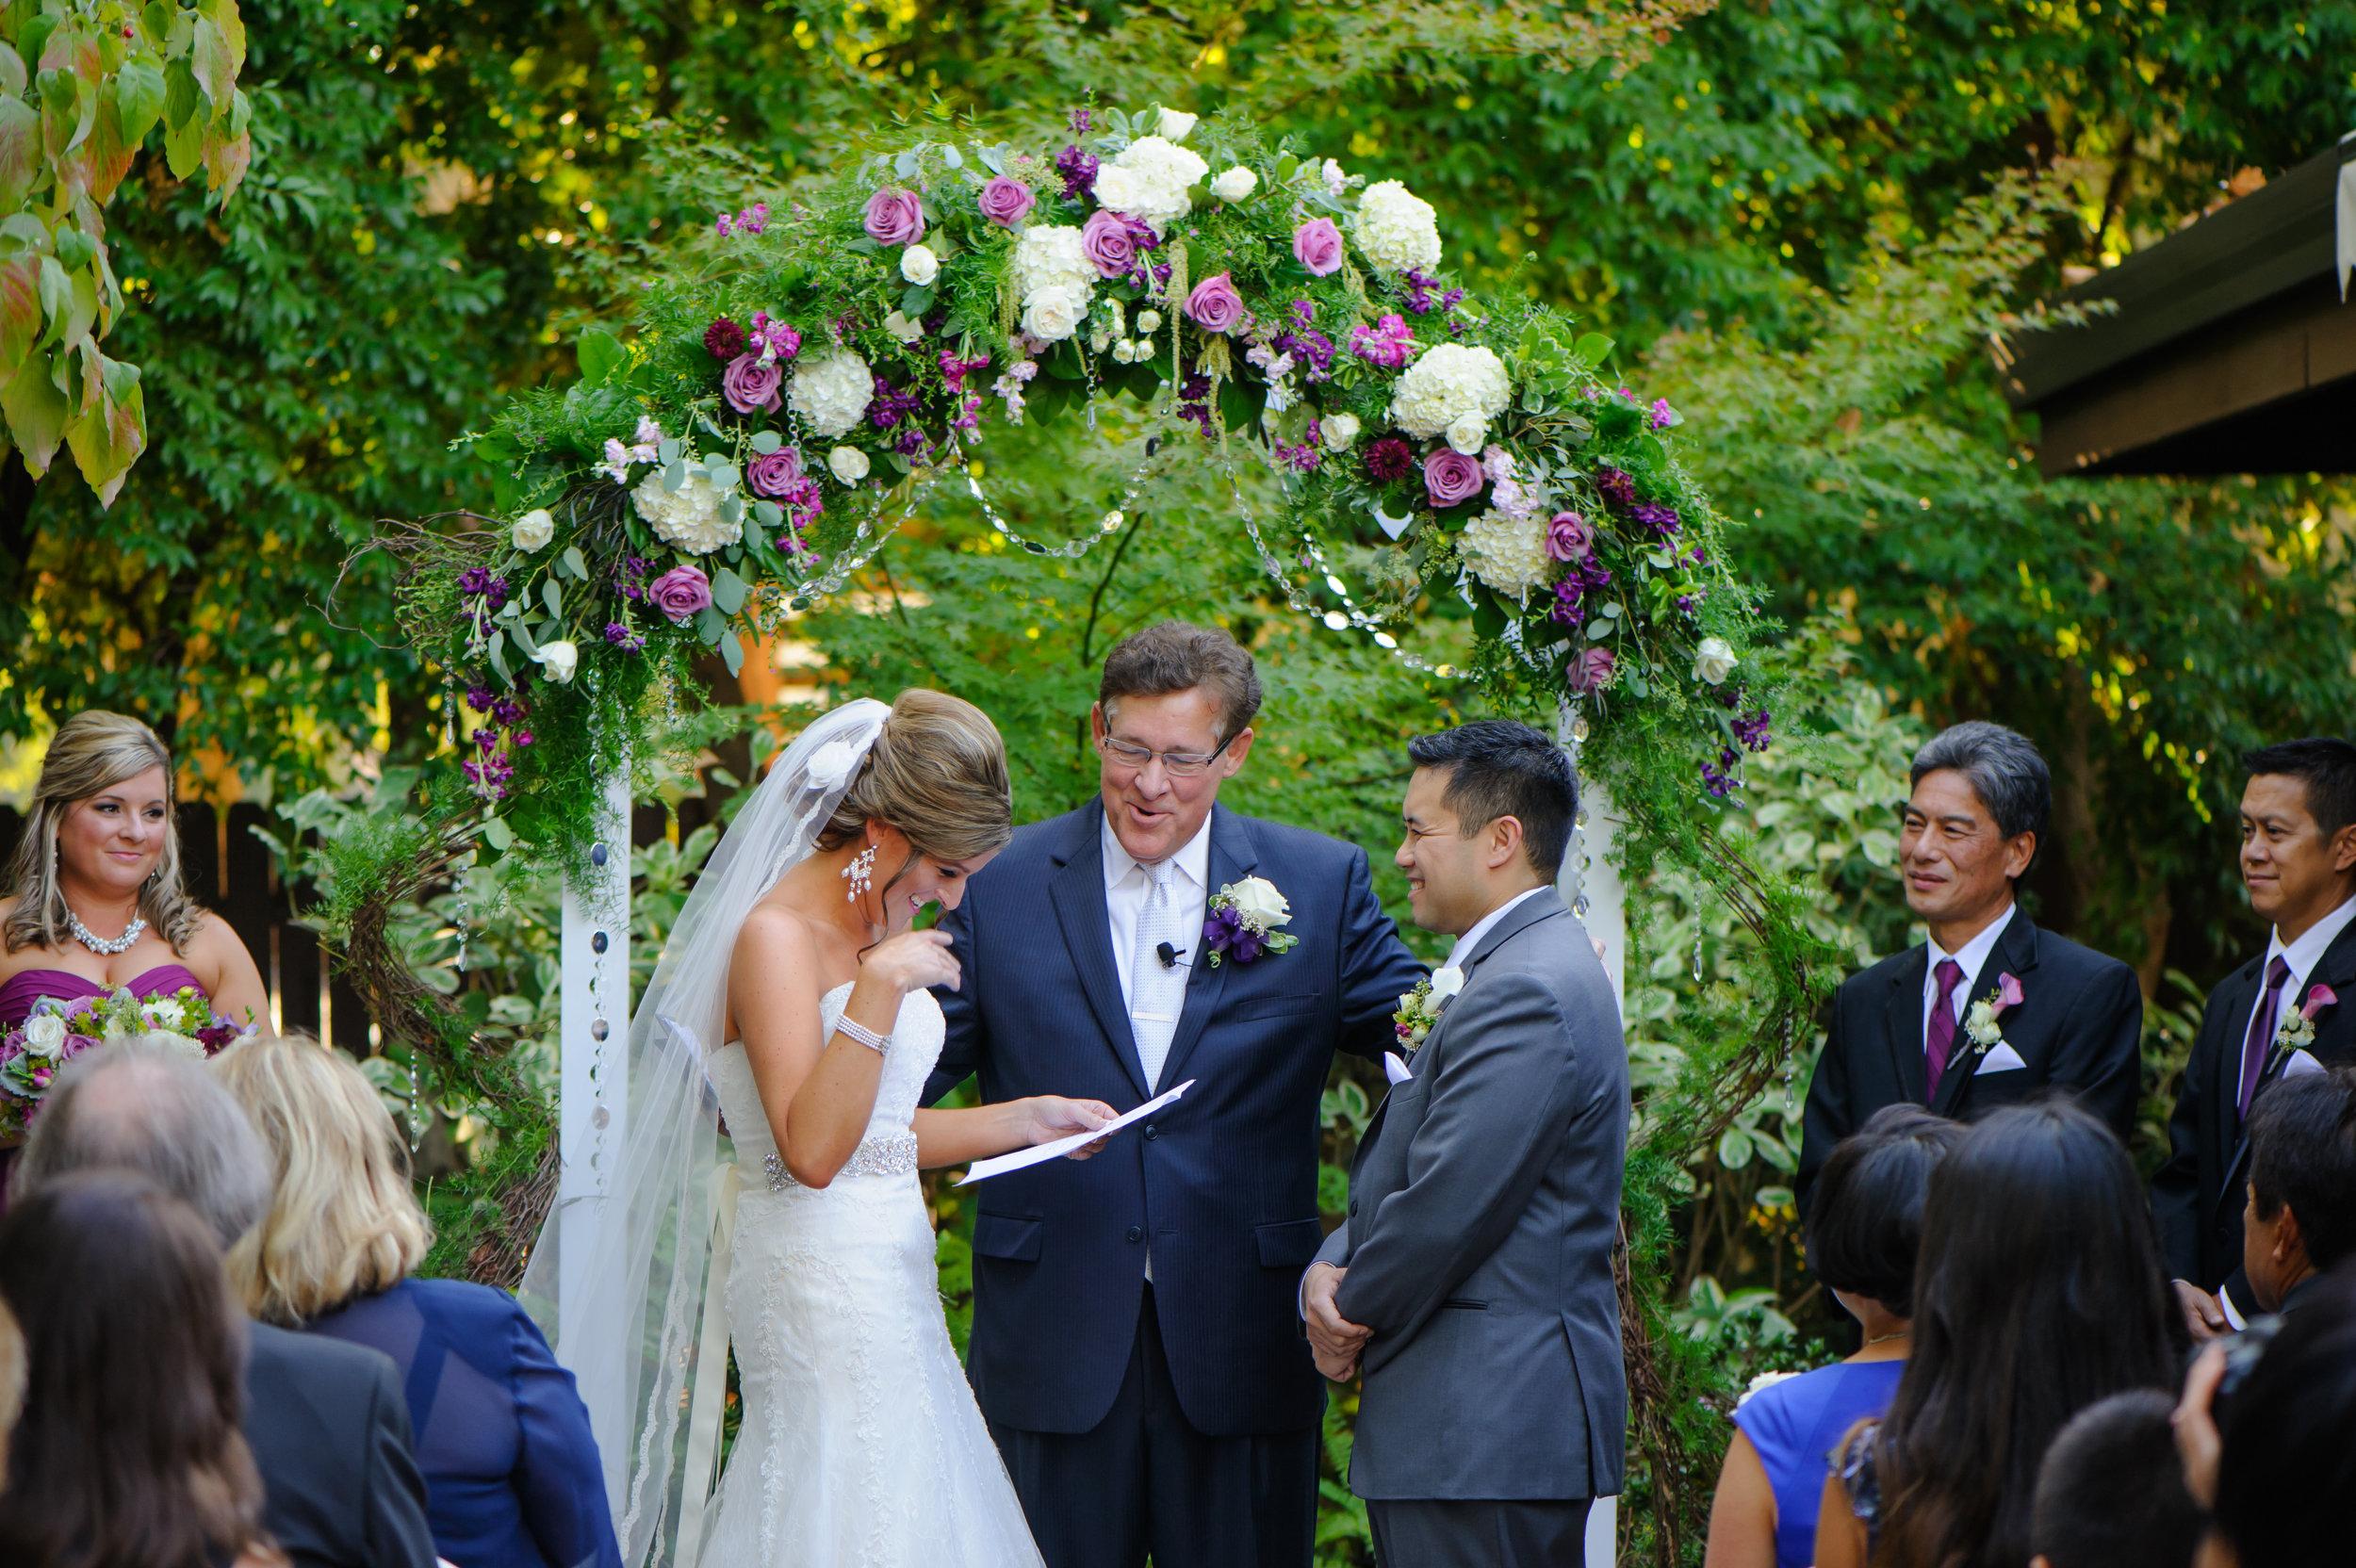 susan-brad-014-sacramento-wedding-photographer-katherine-nicole-photography.JPG